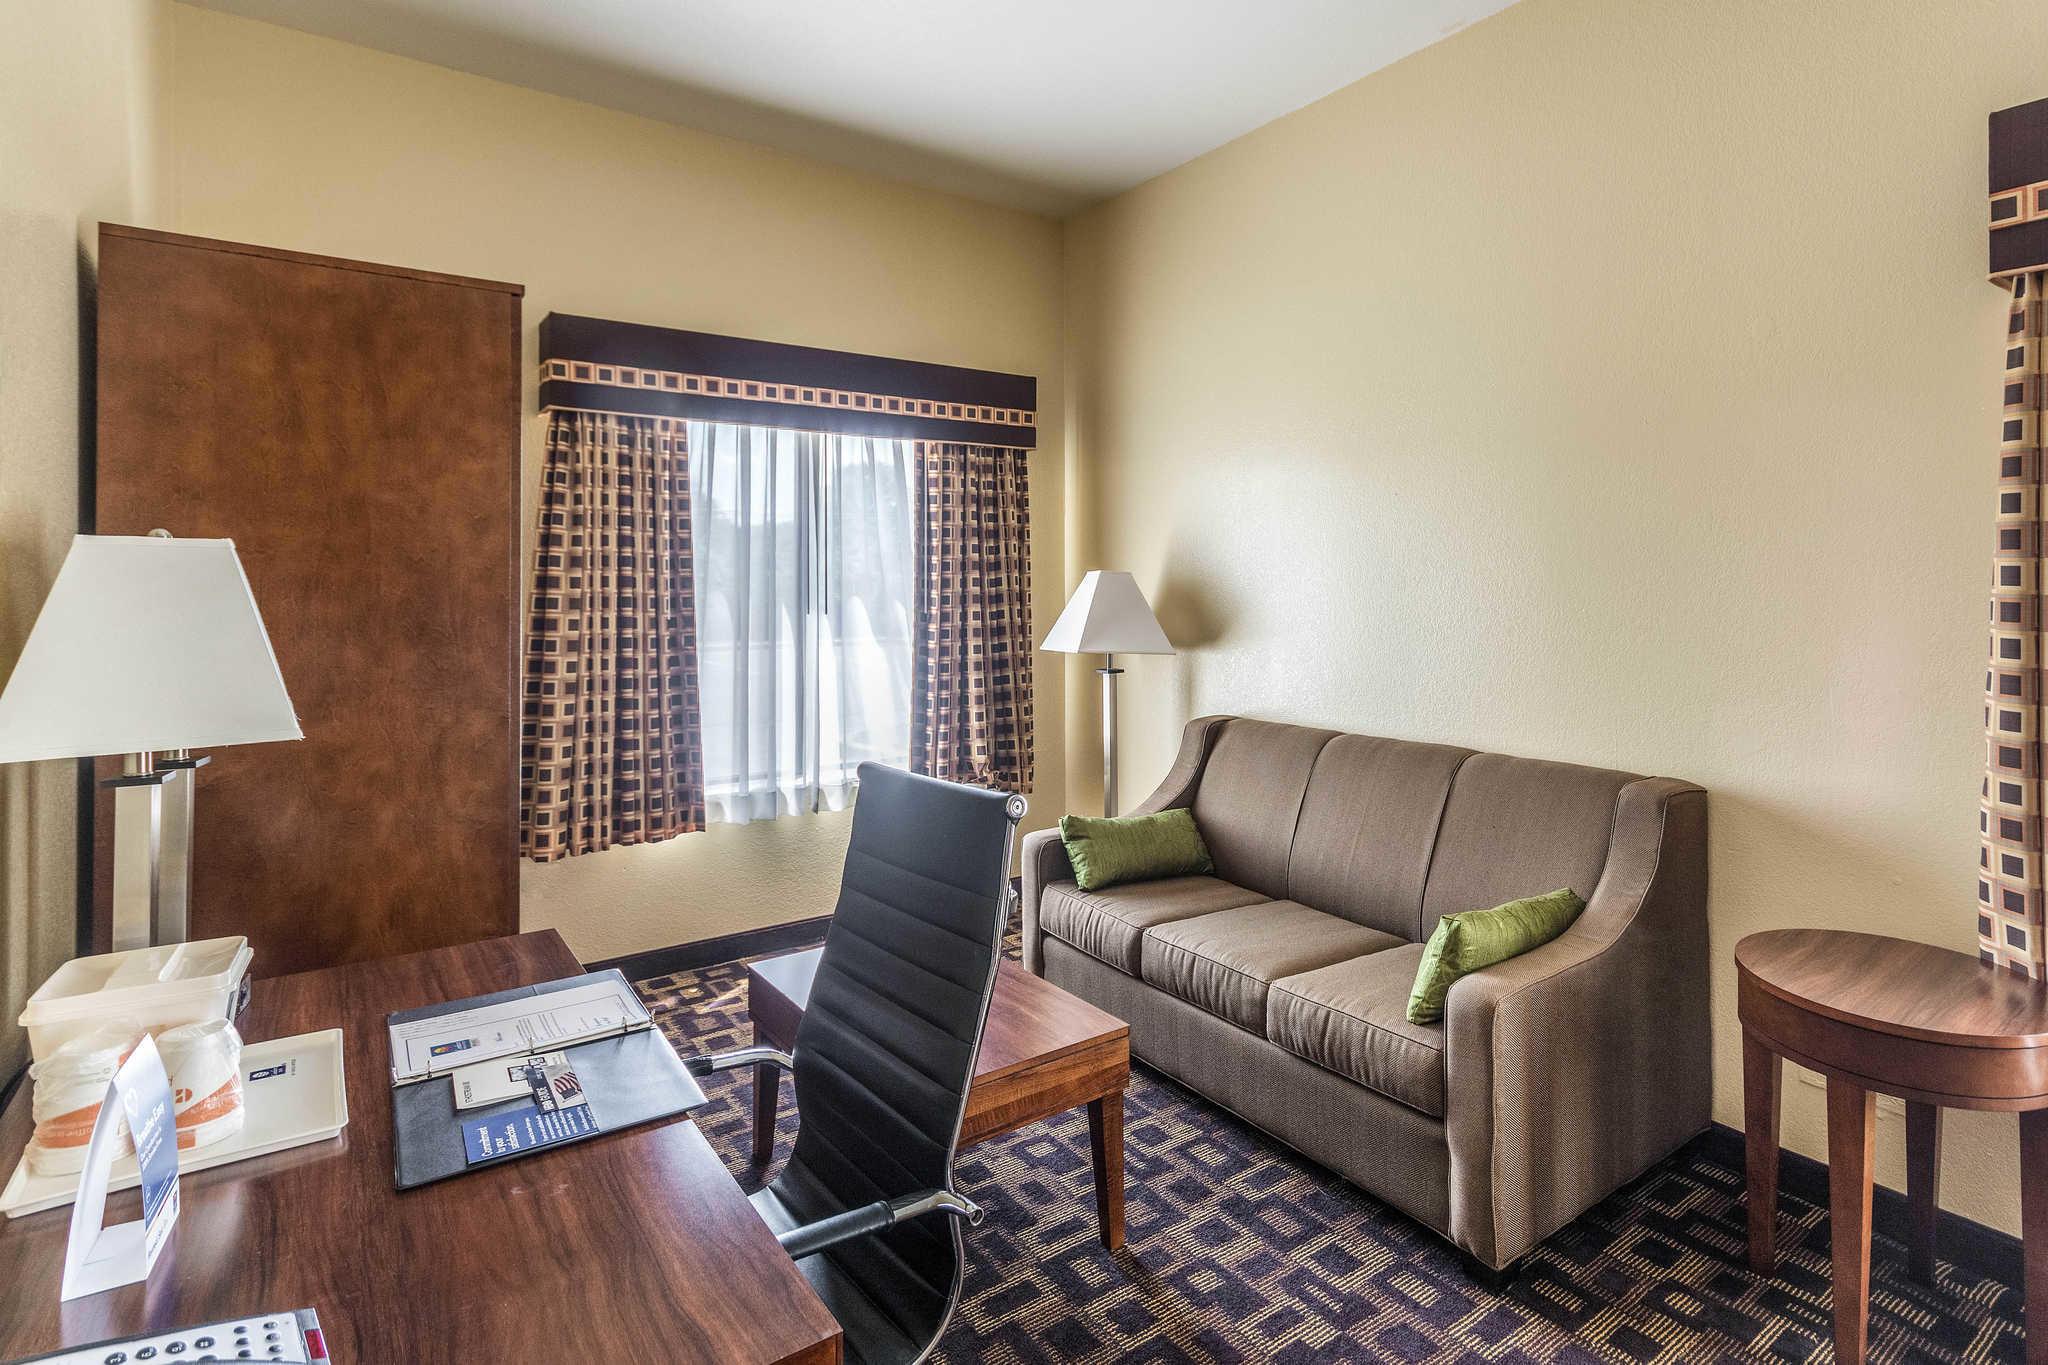 Comfort Inn & Suites North Aurora - Naperville image 27